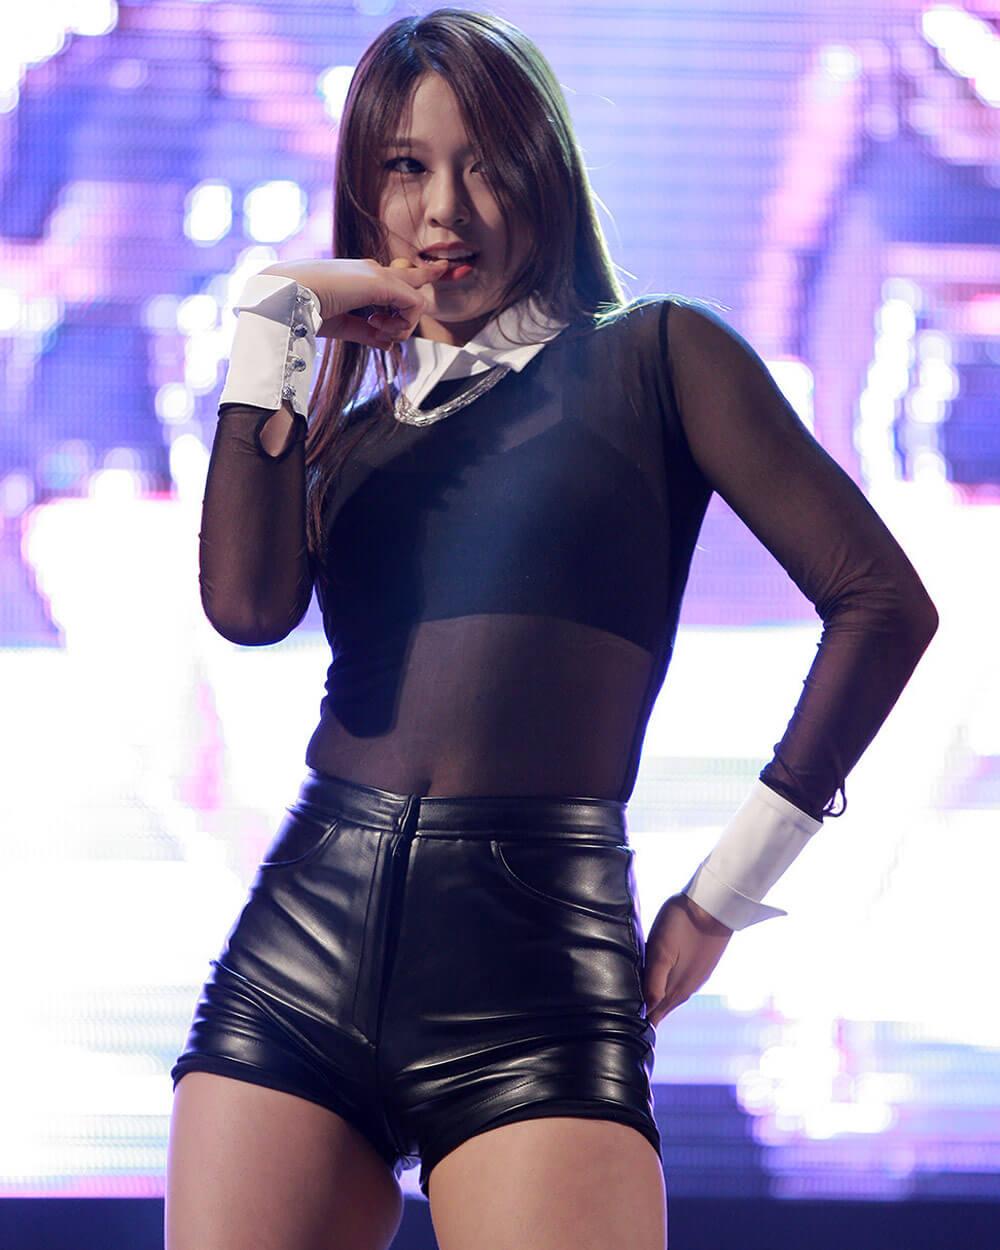 Seolhyun (설현) Korean Beauty Idol